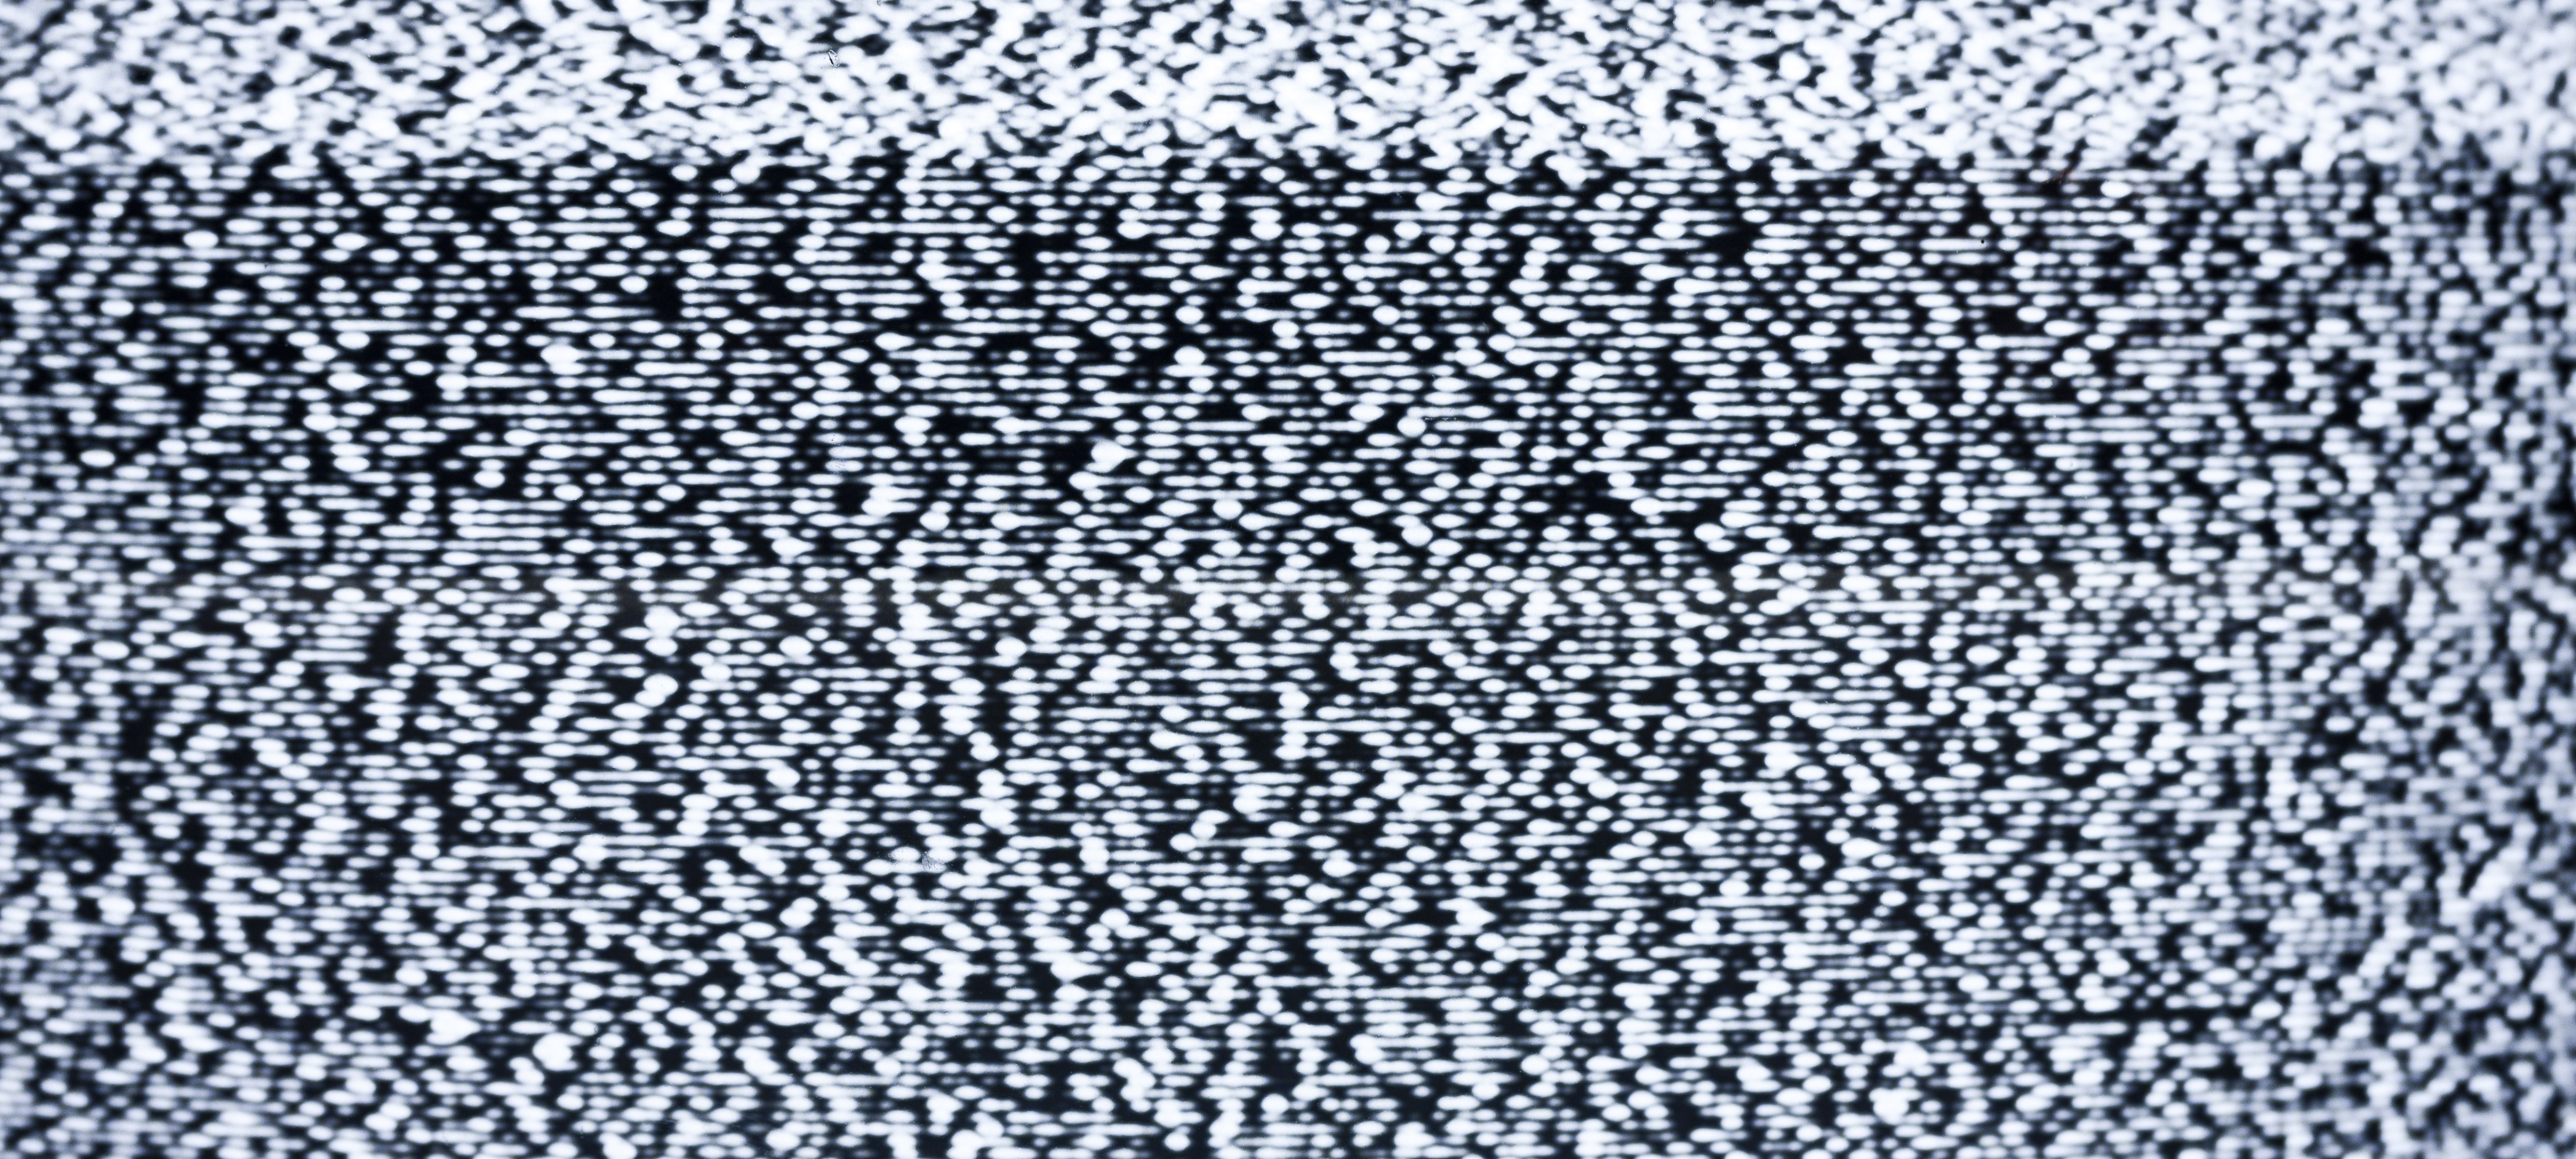 YESNetwork TV Blackout